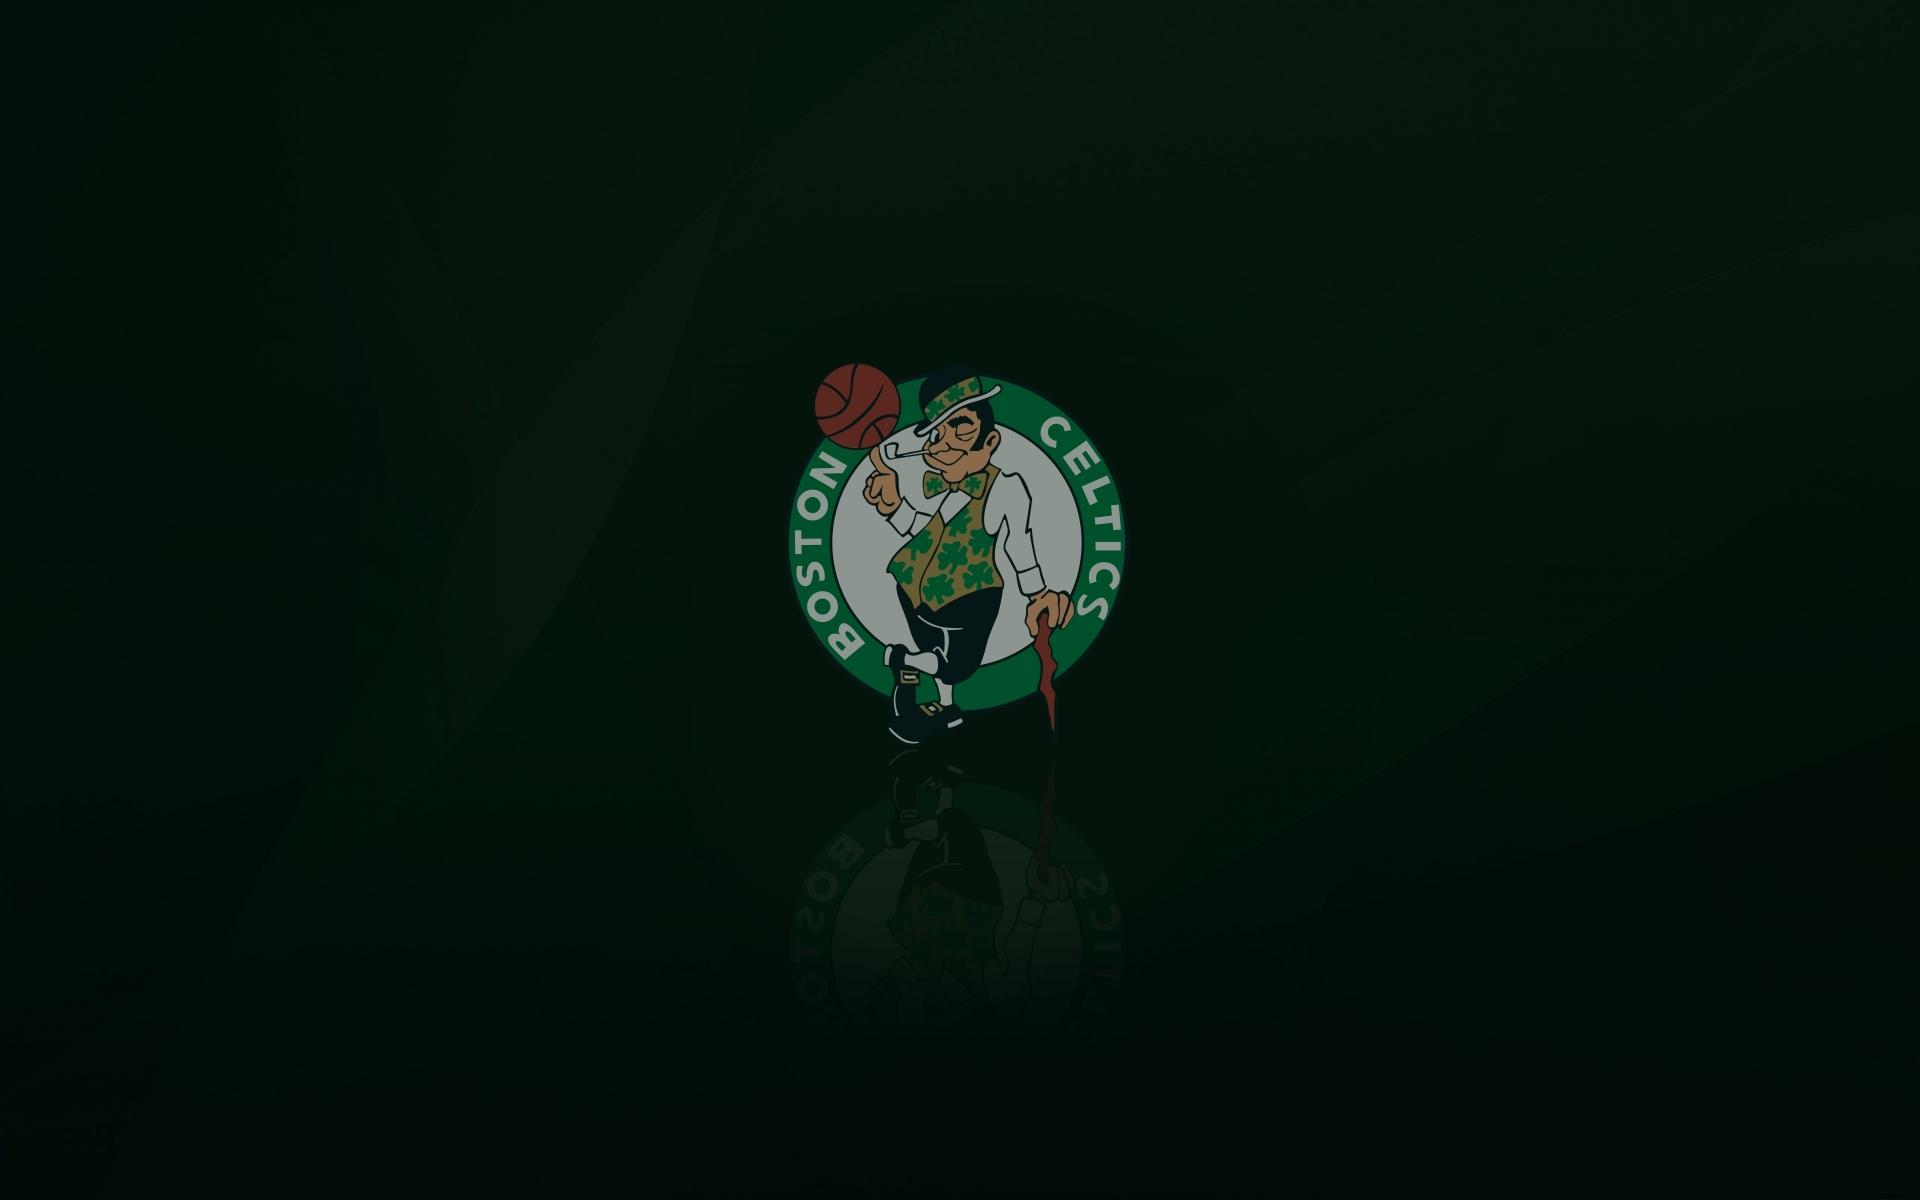 Boston Celtics Wallpaper With Logo On It 1920x1200